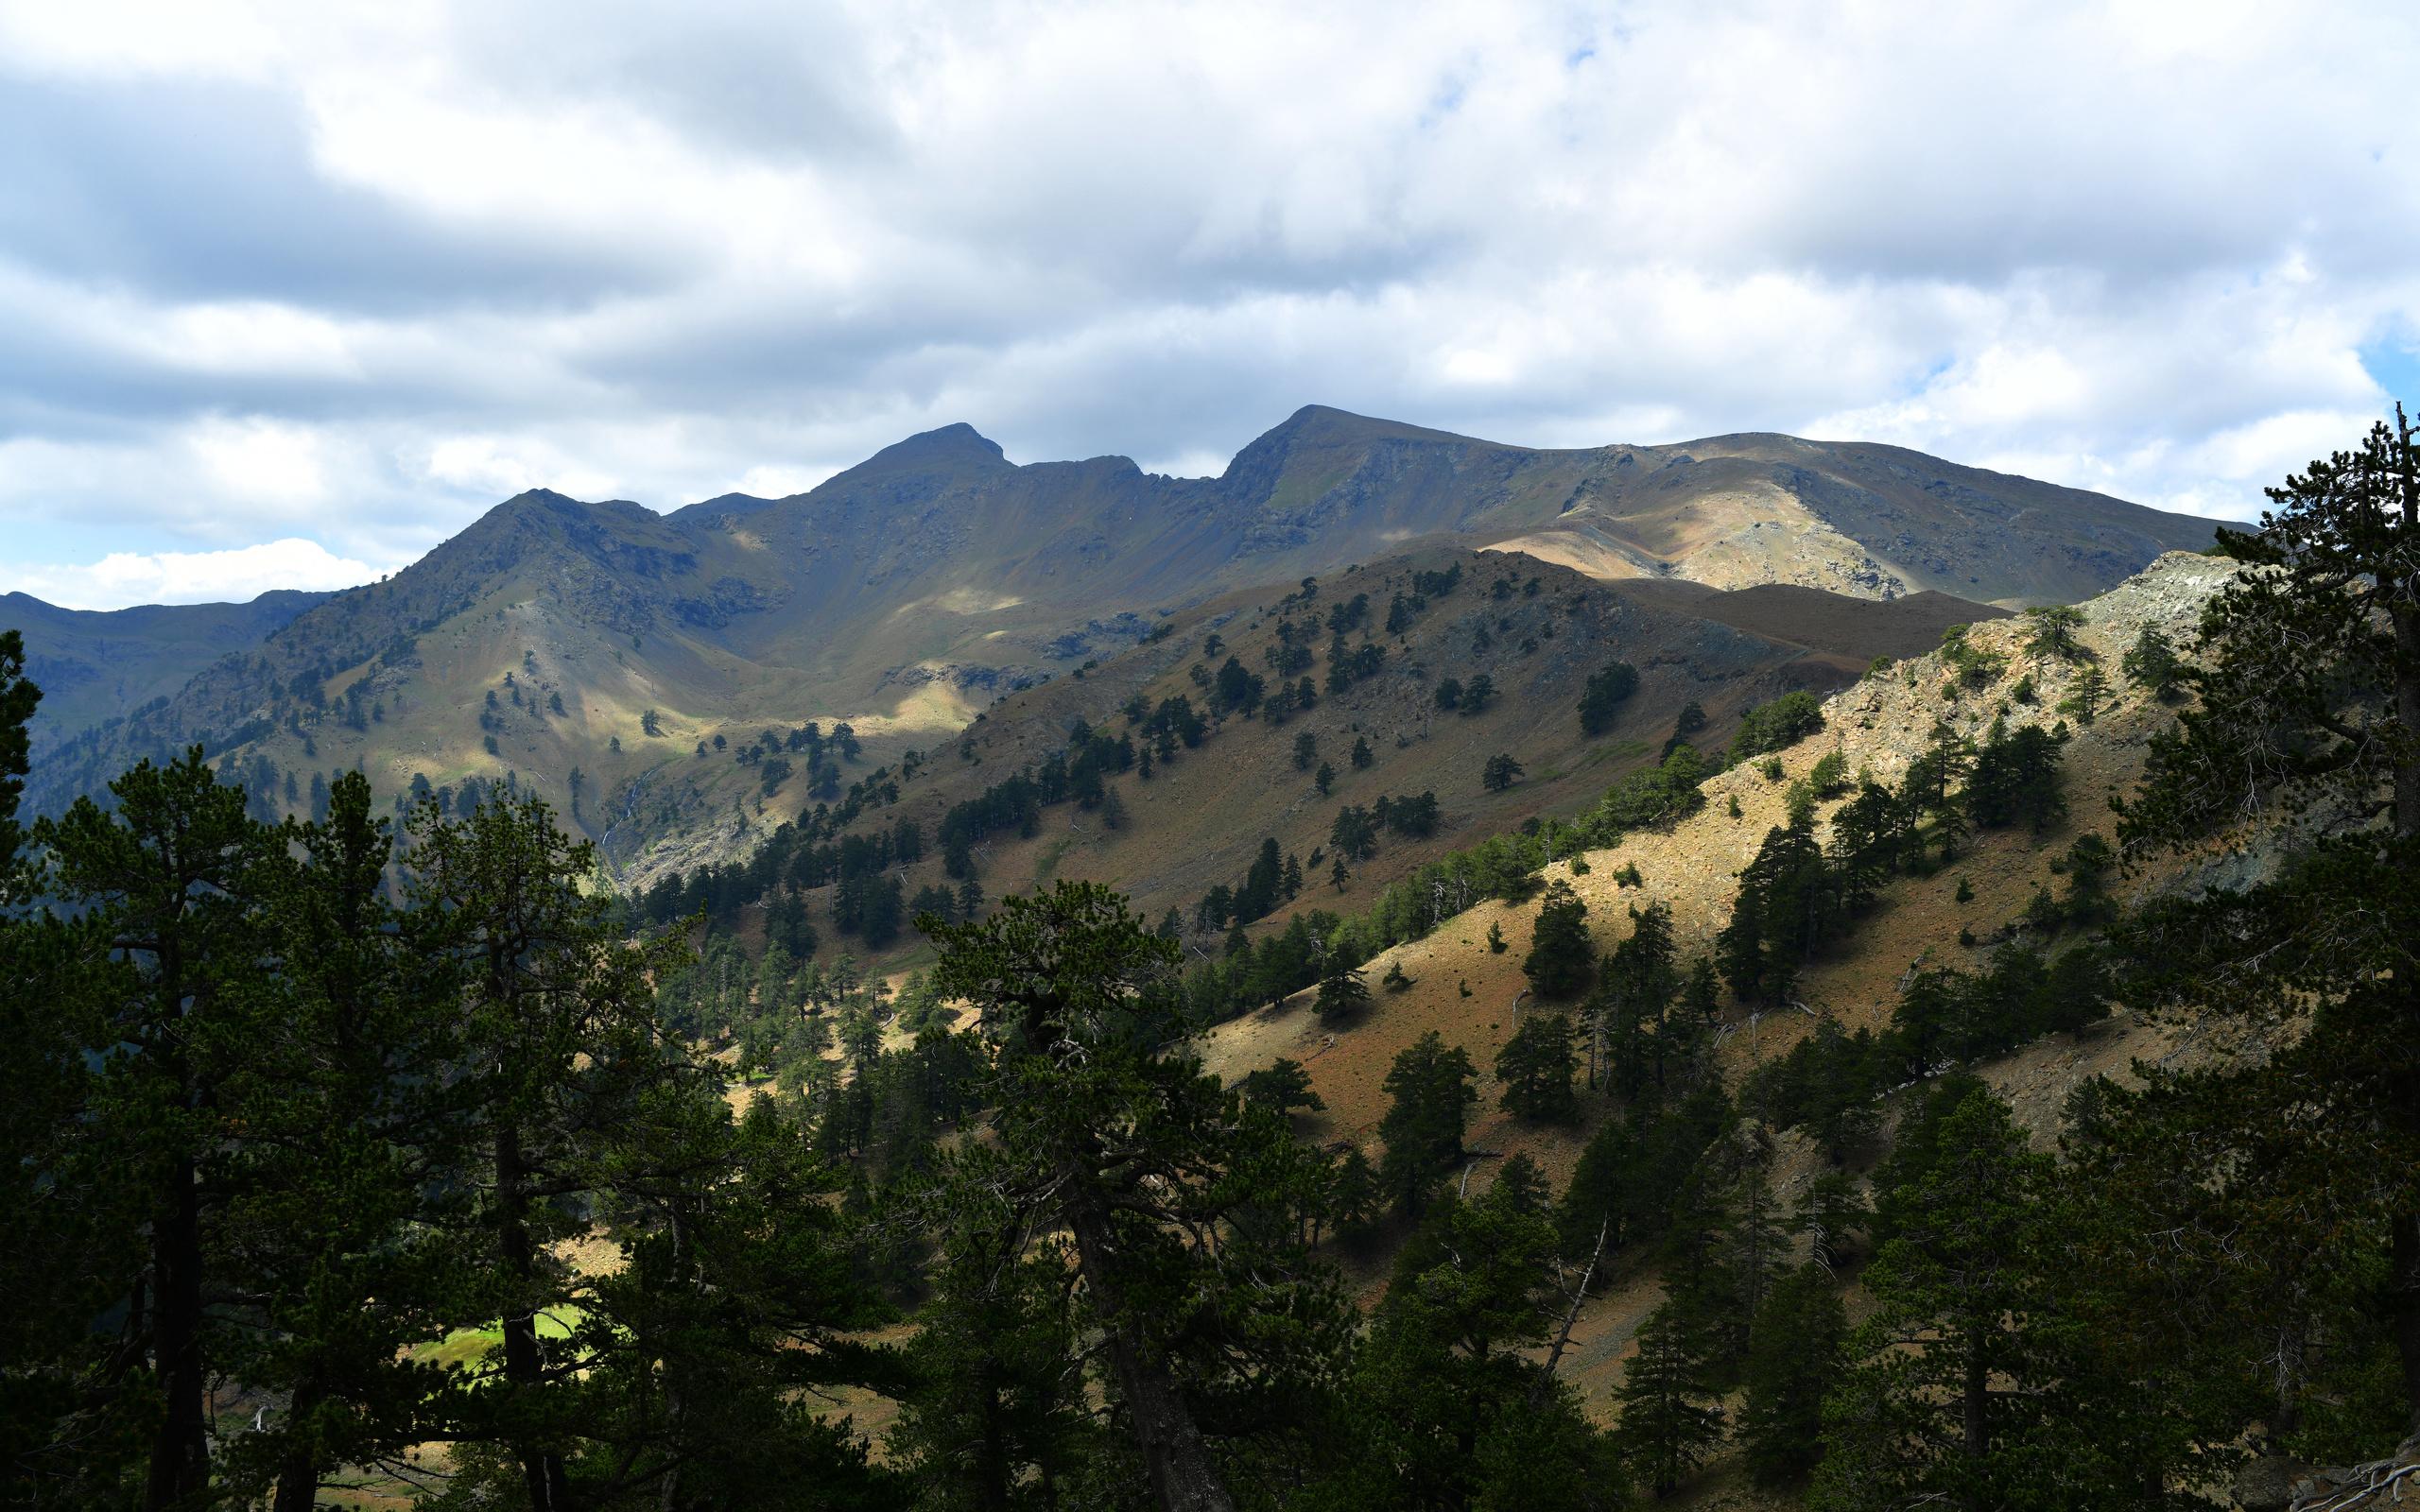 горы, скалы, ель, деревья, склон